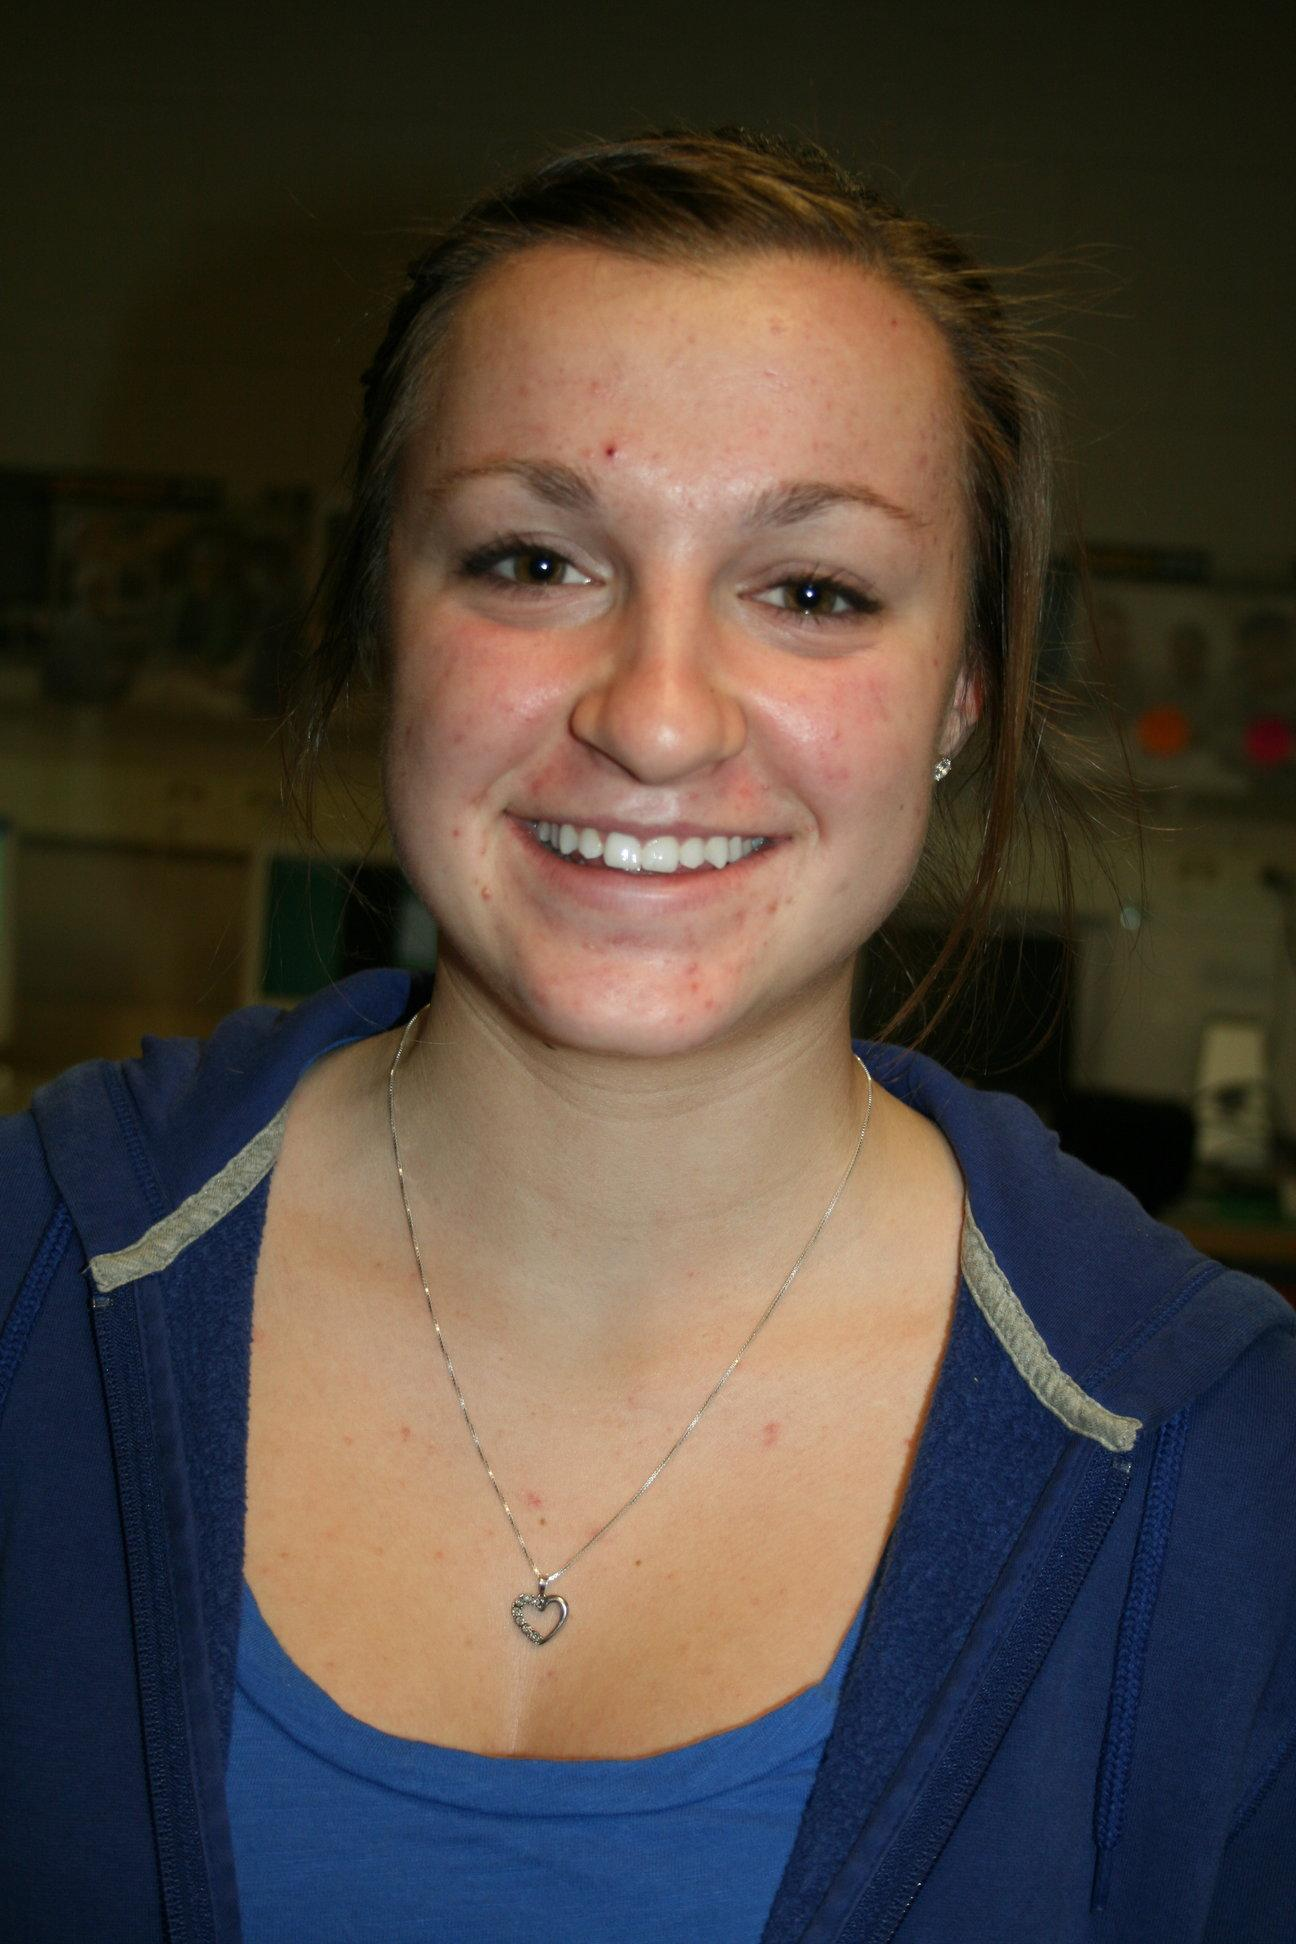 Senior Danielle Hamilton